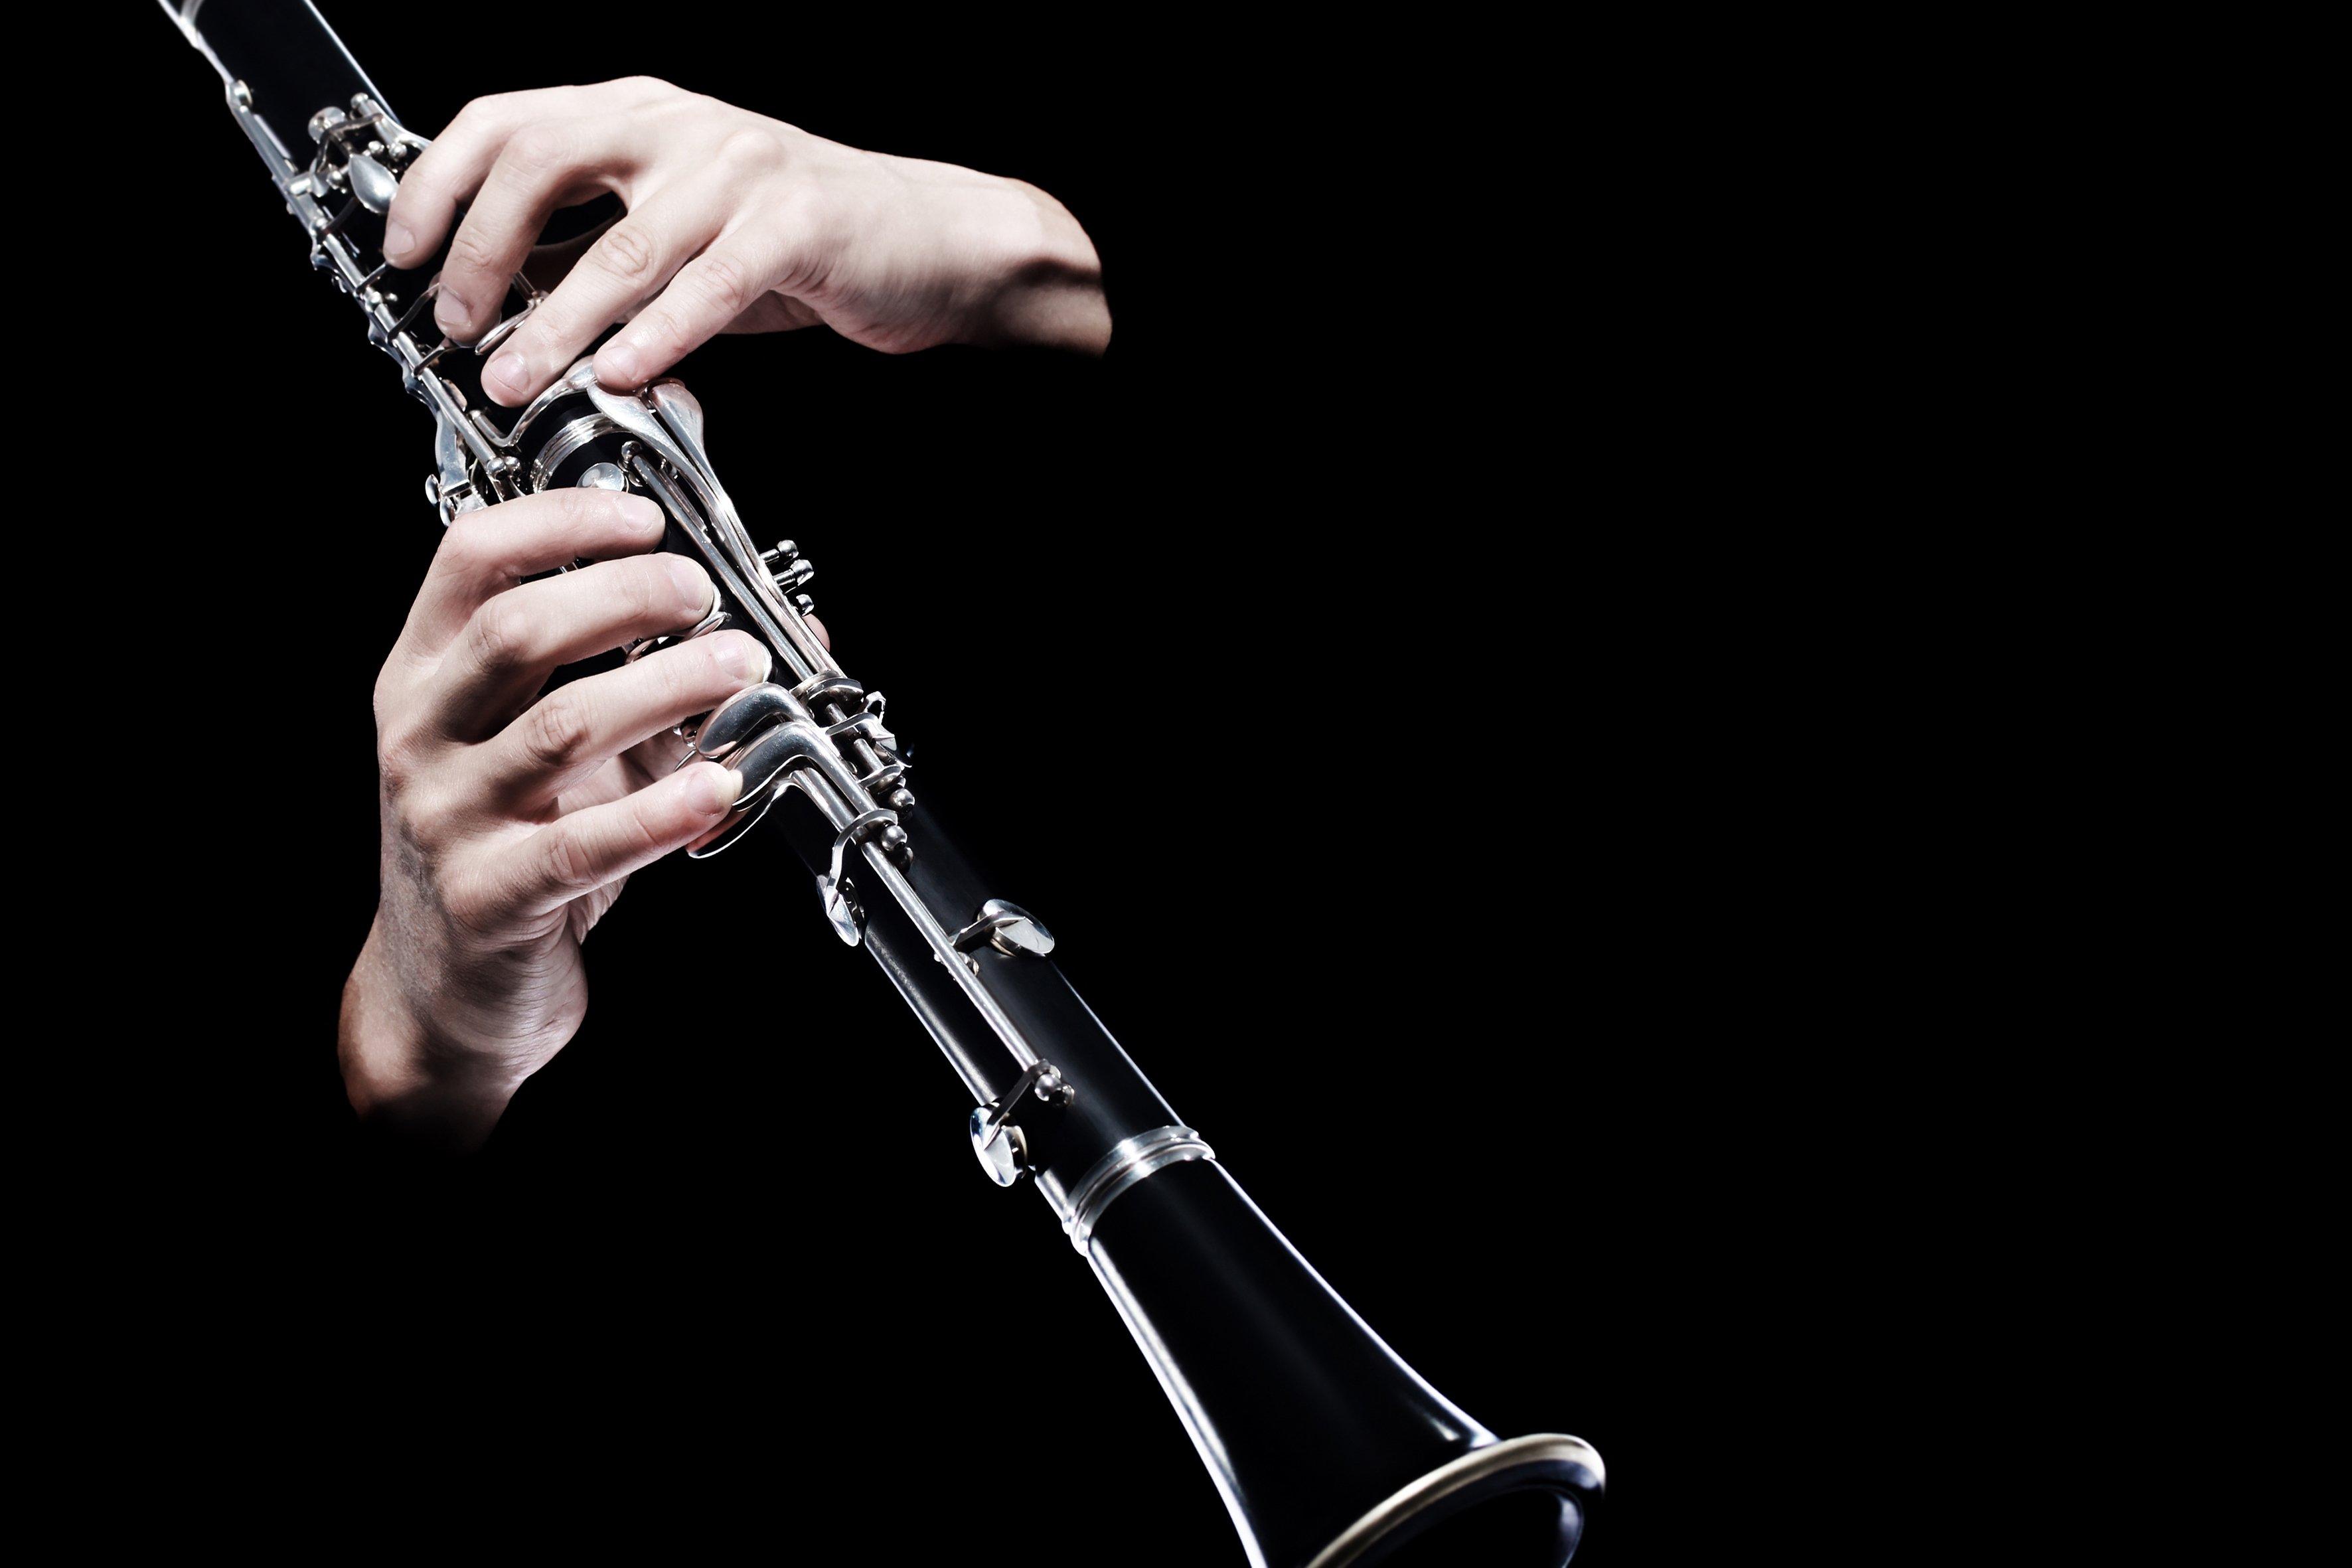 Clarinete siendo tocado || Fuente: Shutterstock